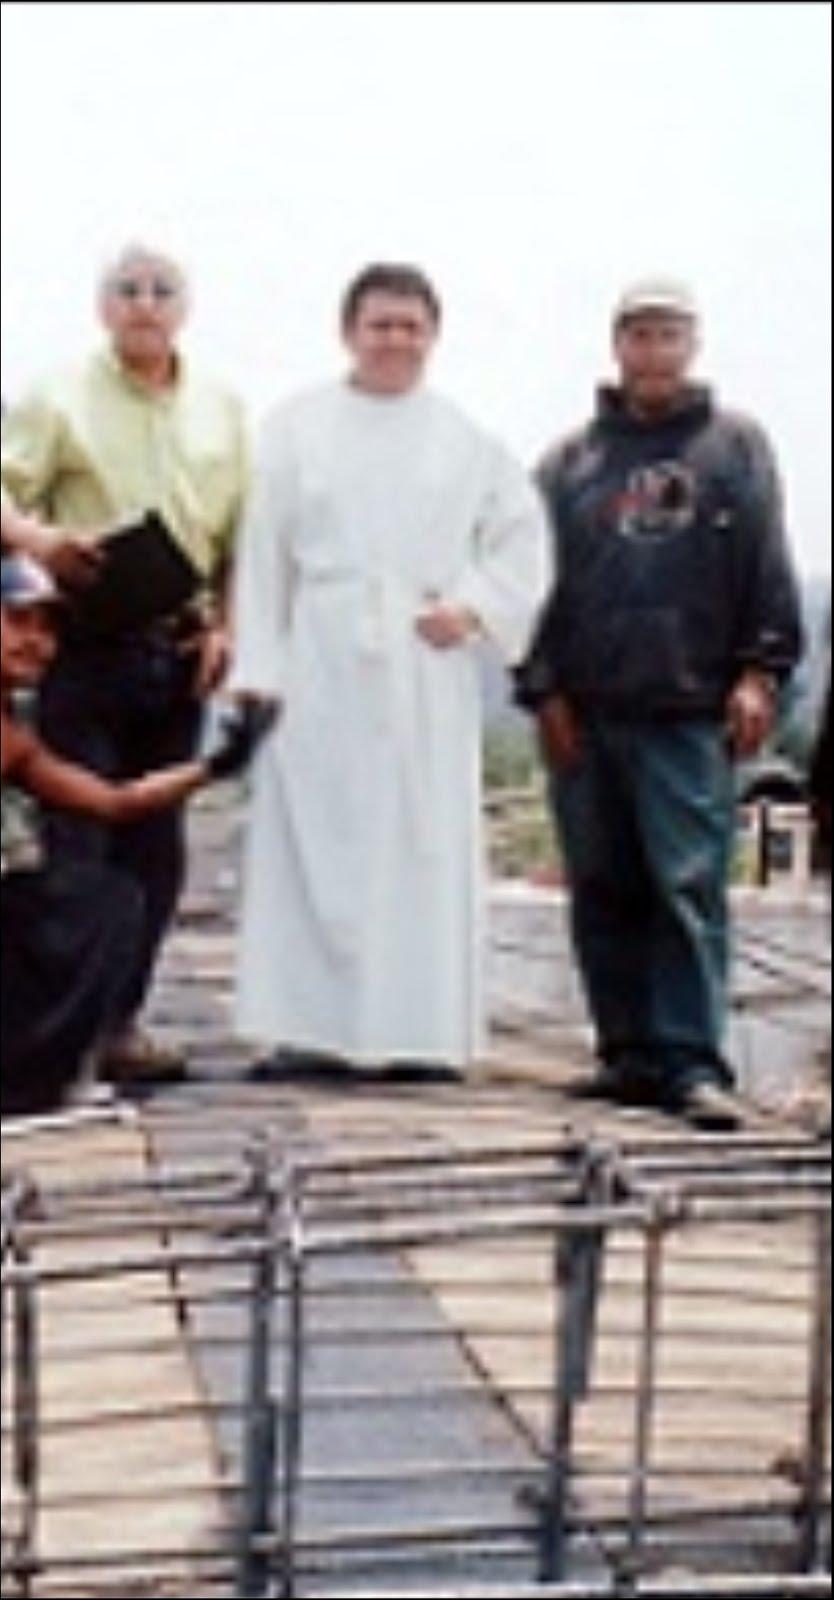 Algunos apuntes de San Juan Tezompa, municipio de Chalco